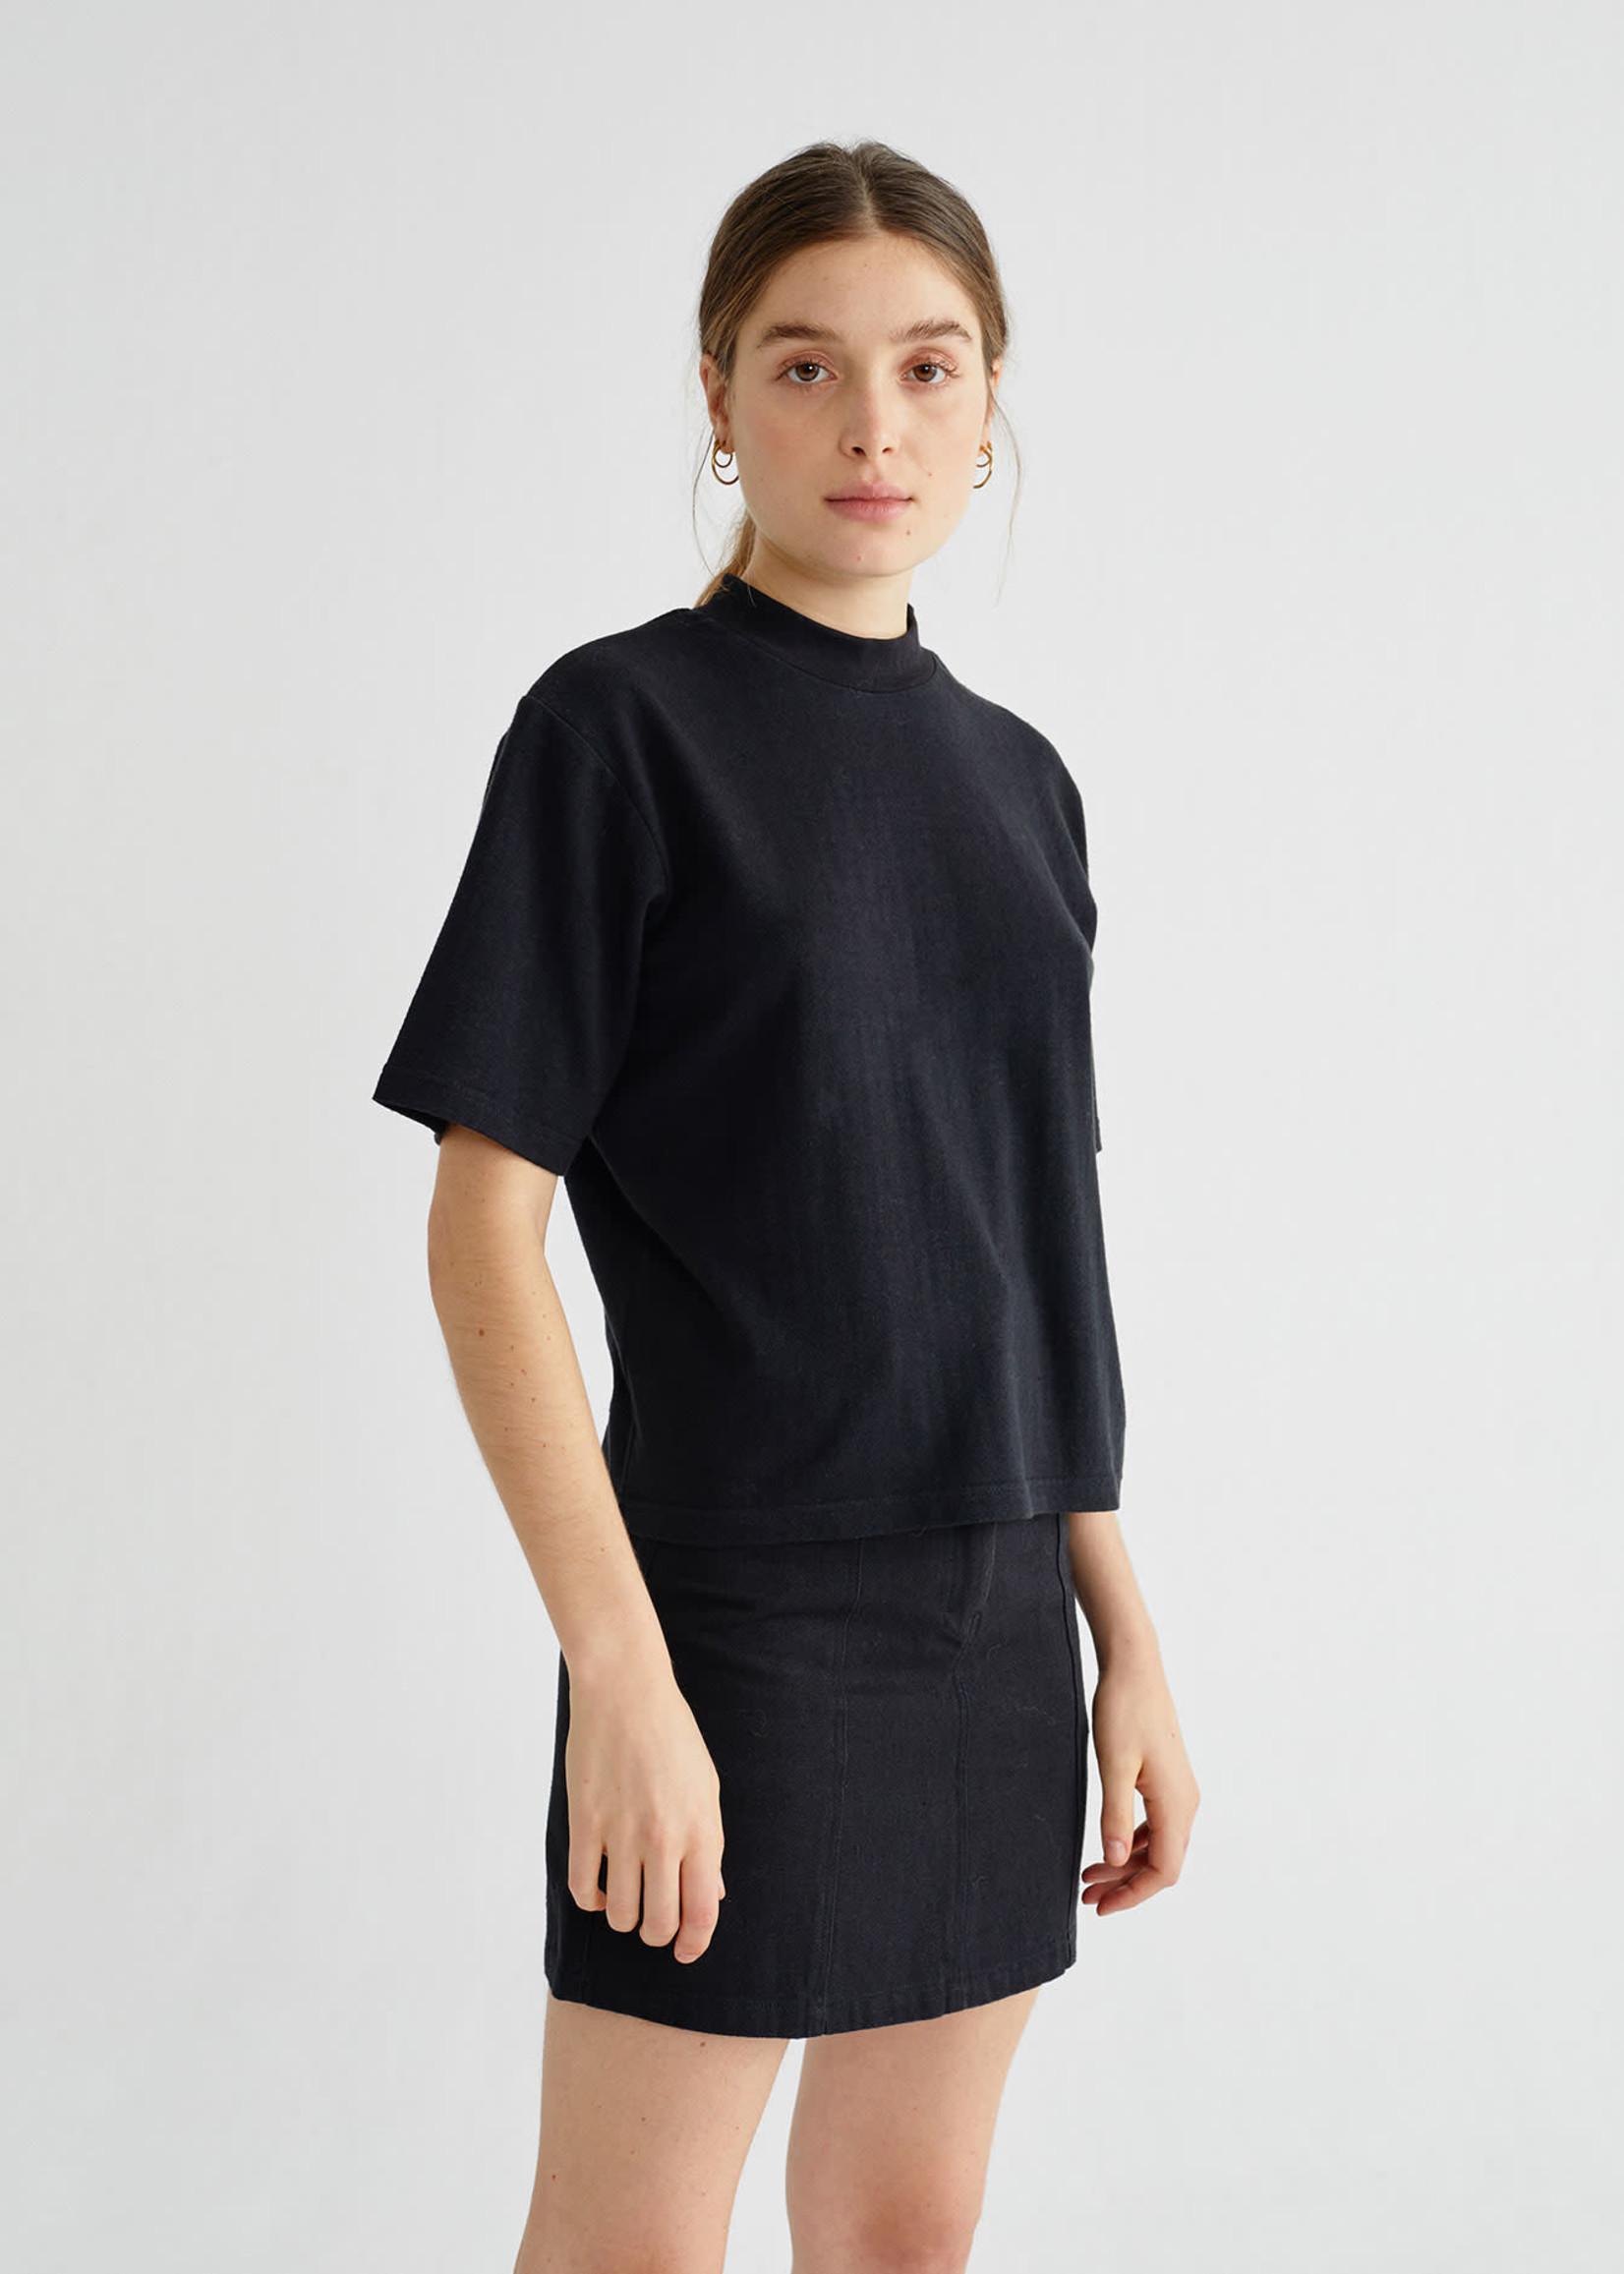 Thinking Mu Black Hemp Aidin T-shirt